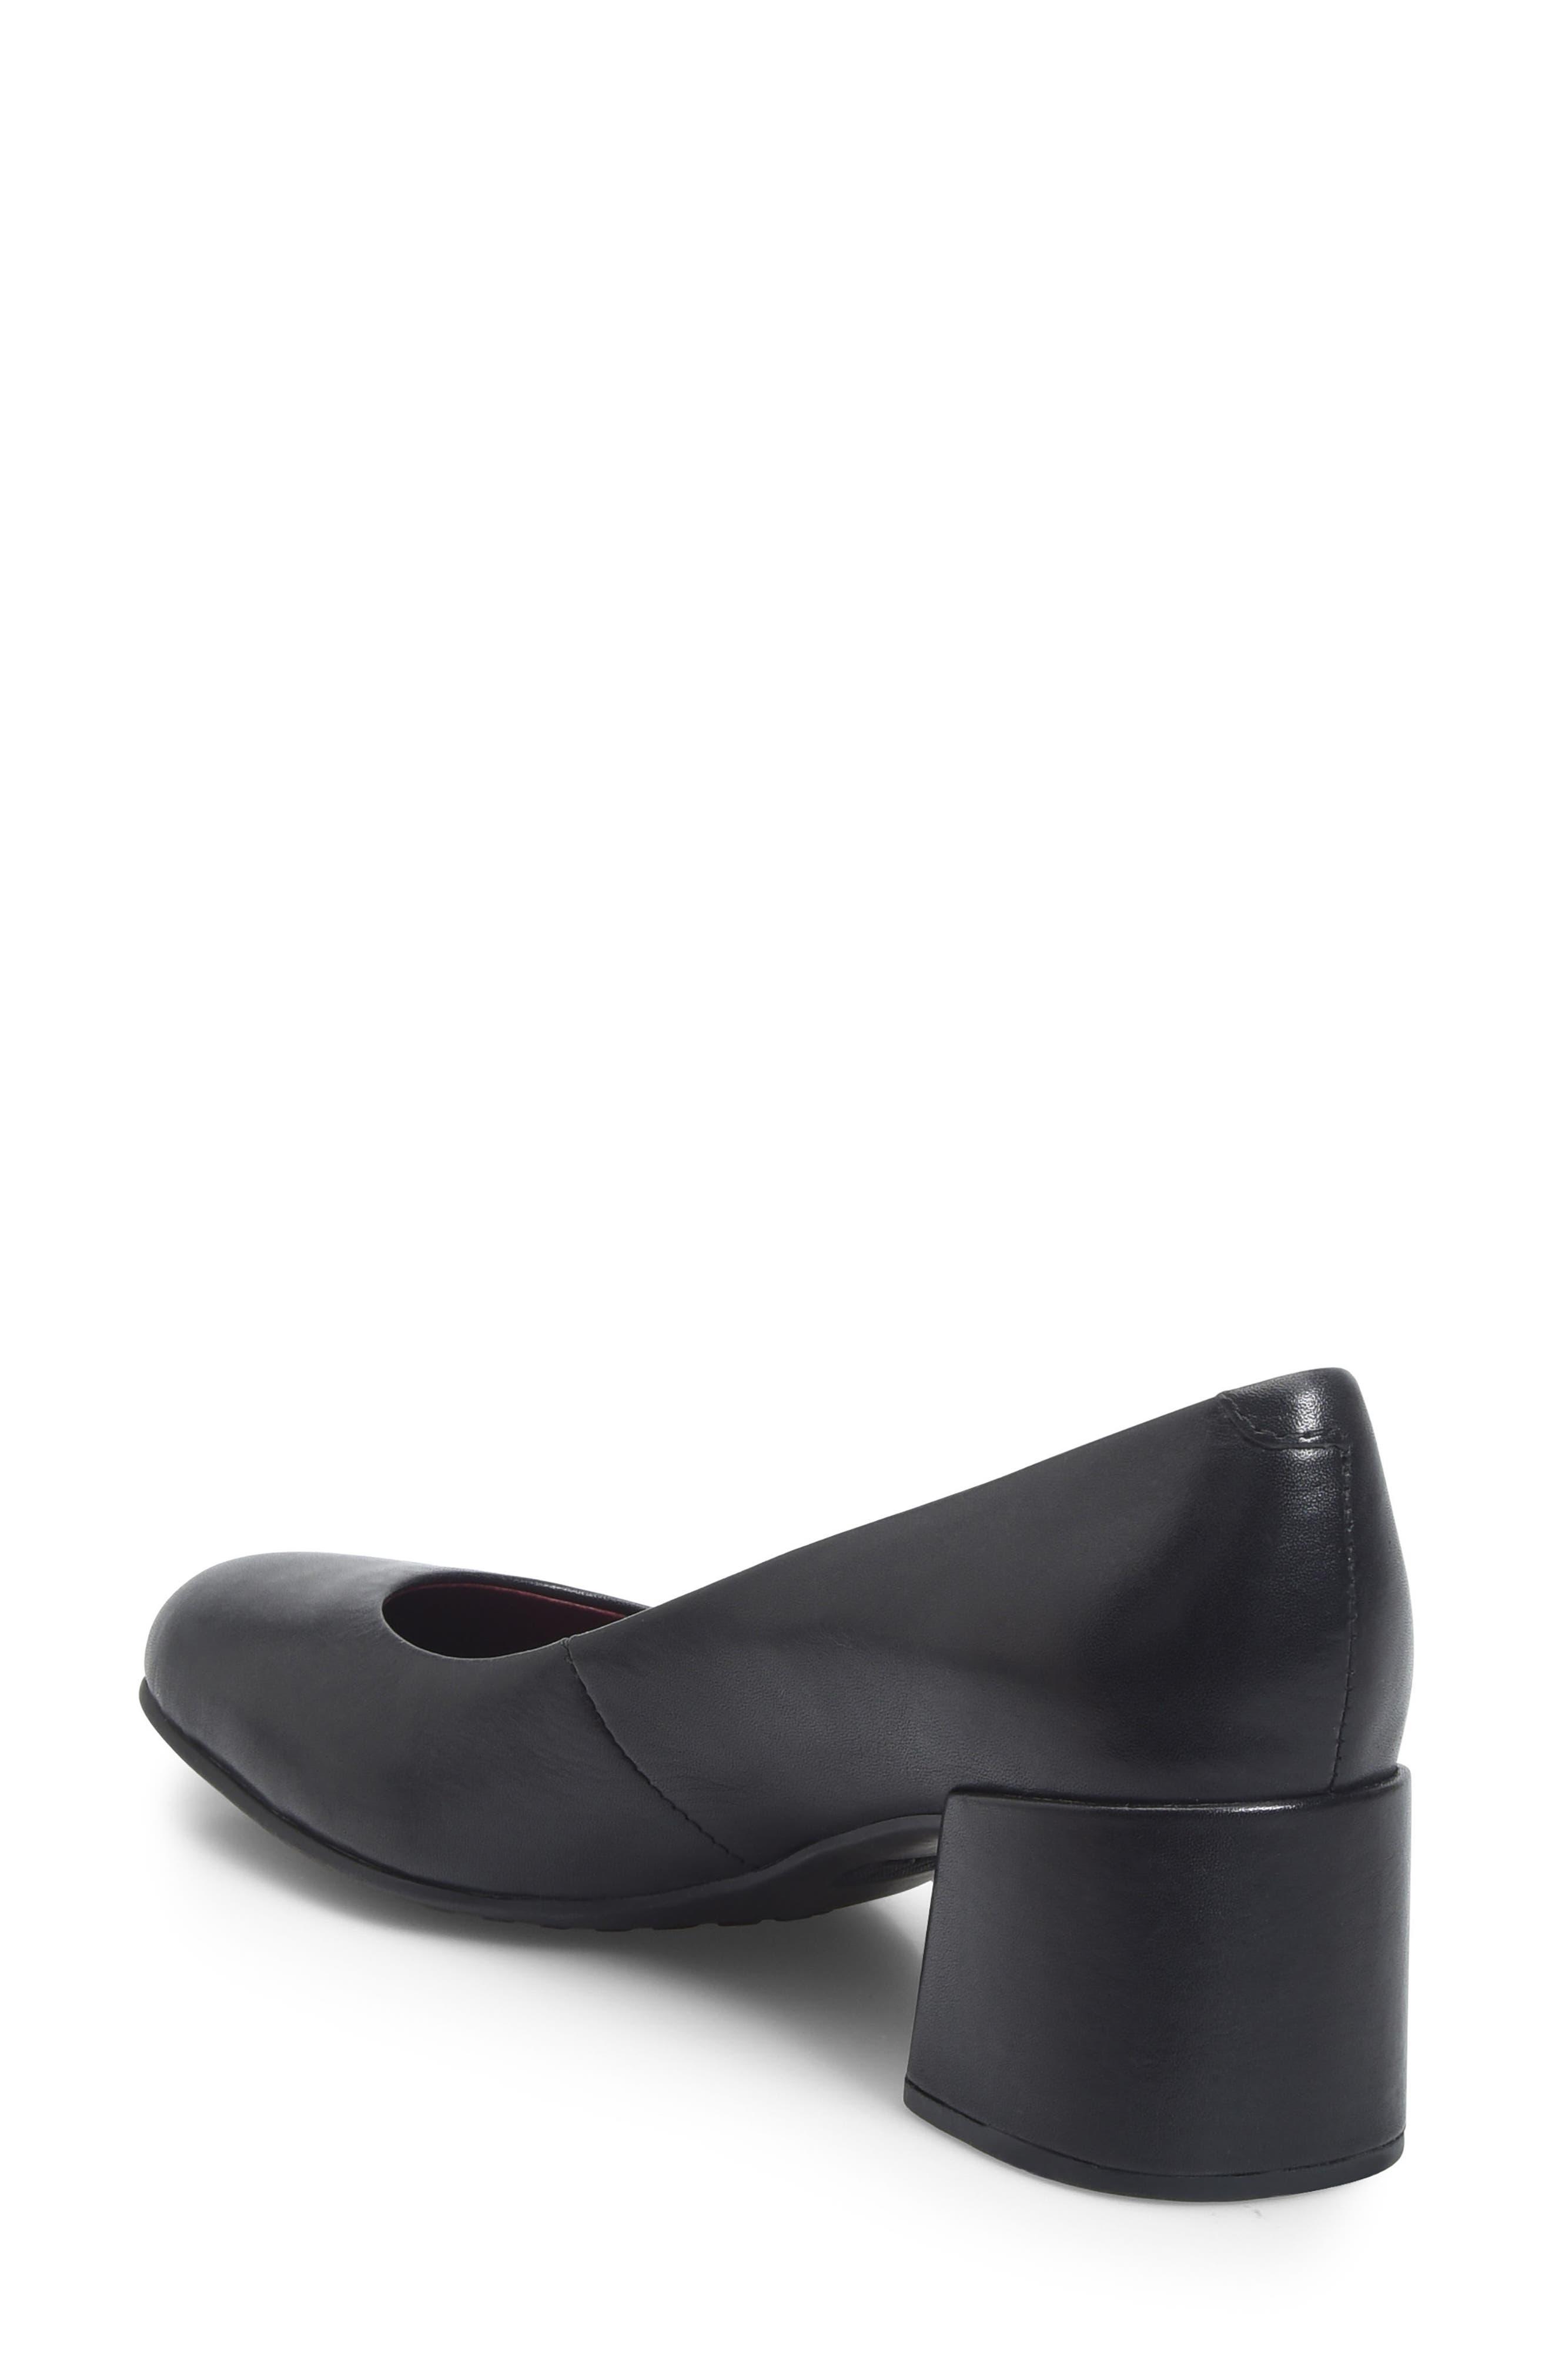 Magnolia Block Heel Pump,                             Alternate thumbnail 2, color,                             Black Leather